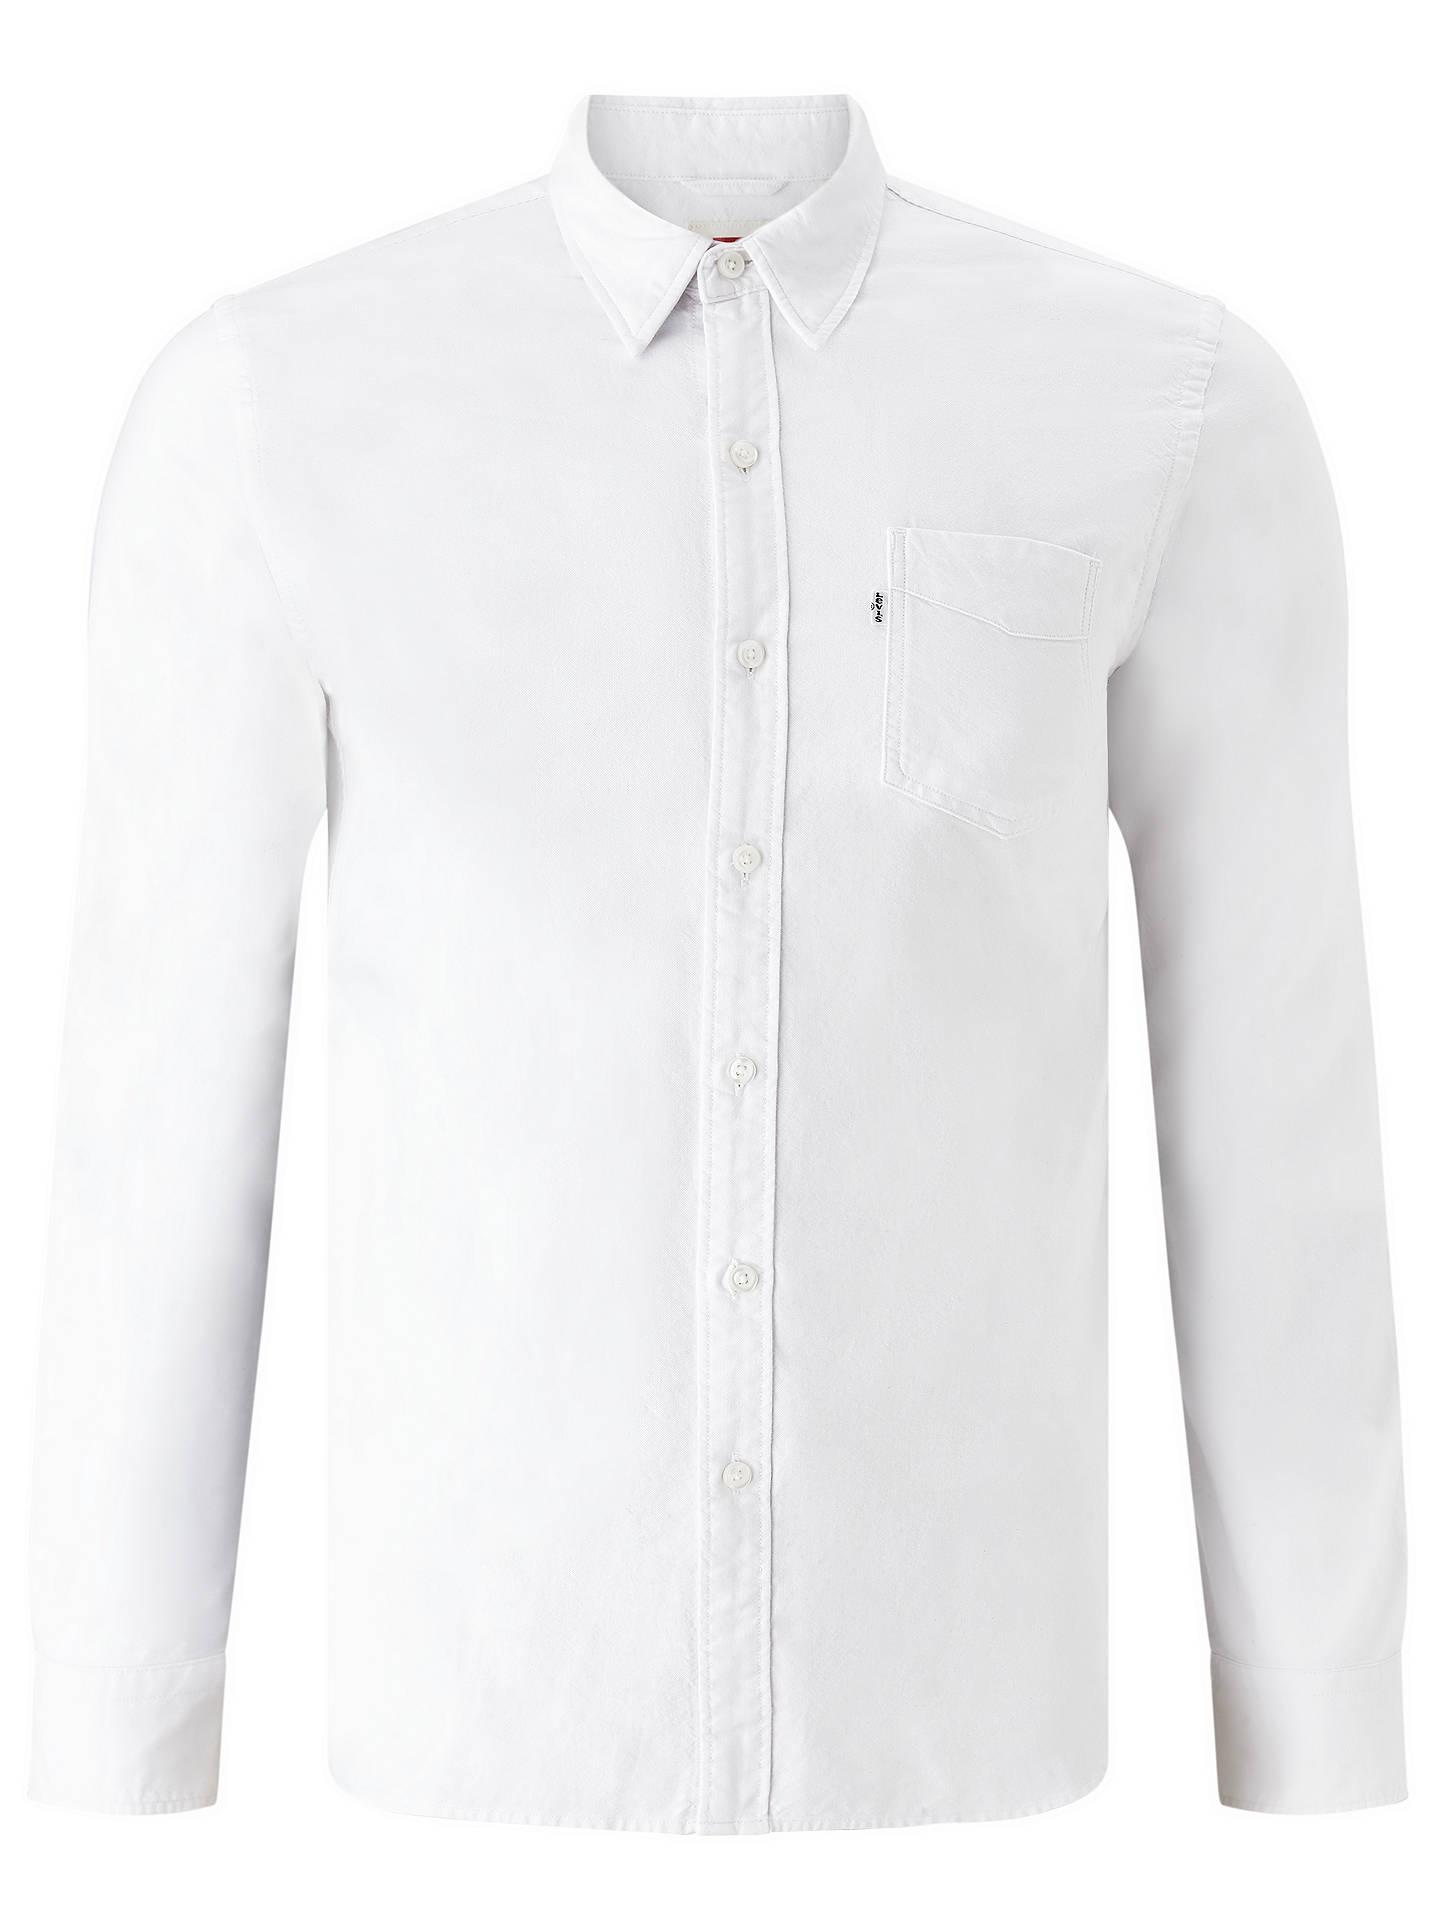 ... BuyLevi's Sunset One Pocket Oxford Shirt, White, S Online at johnlewis. ...